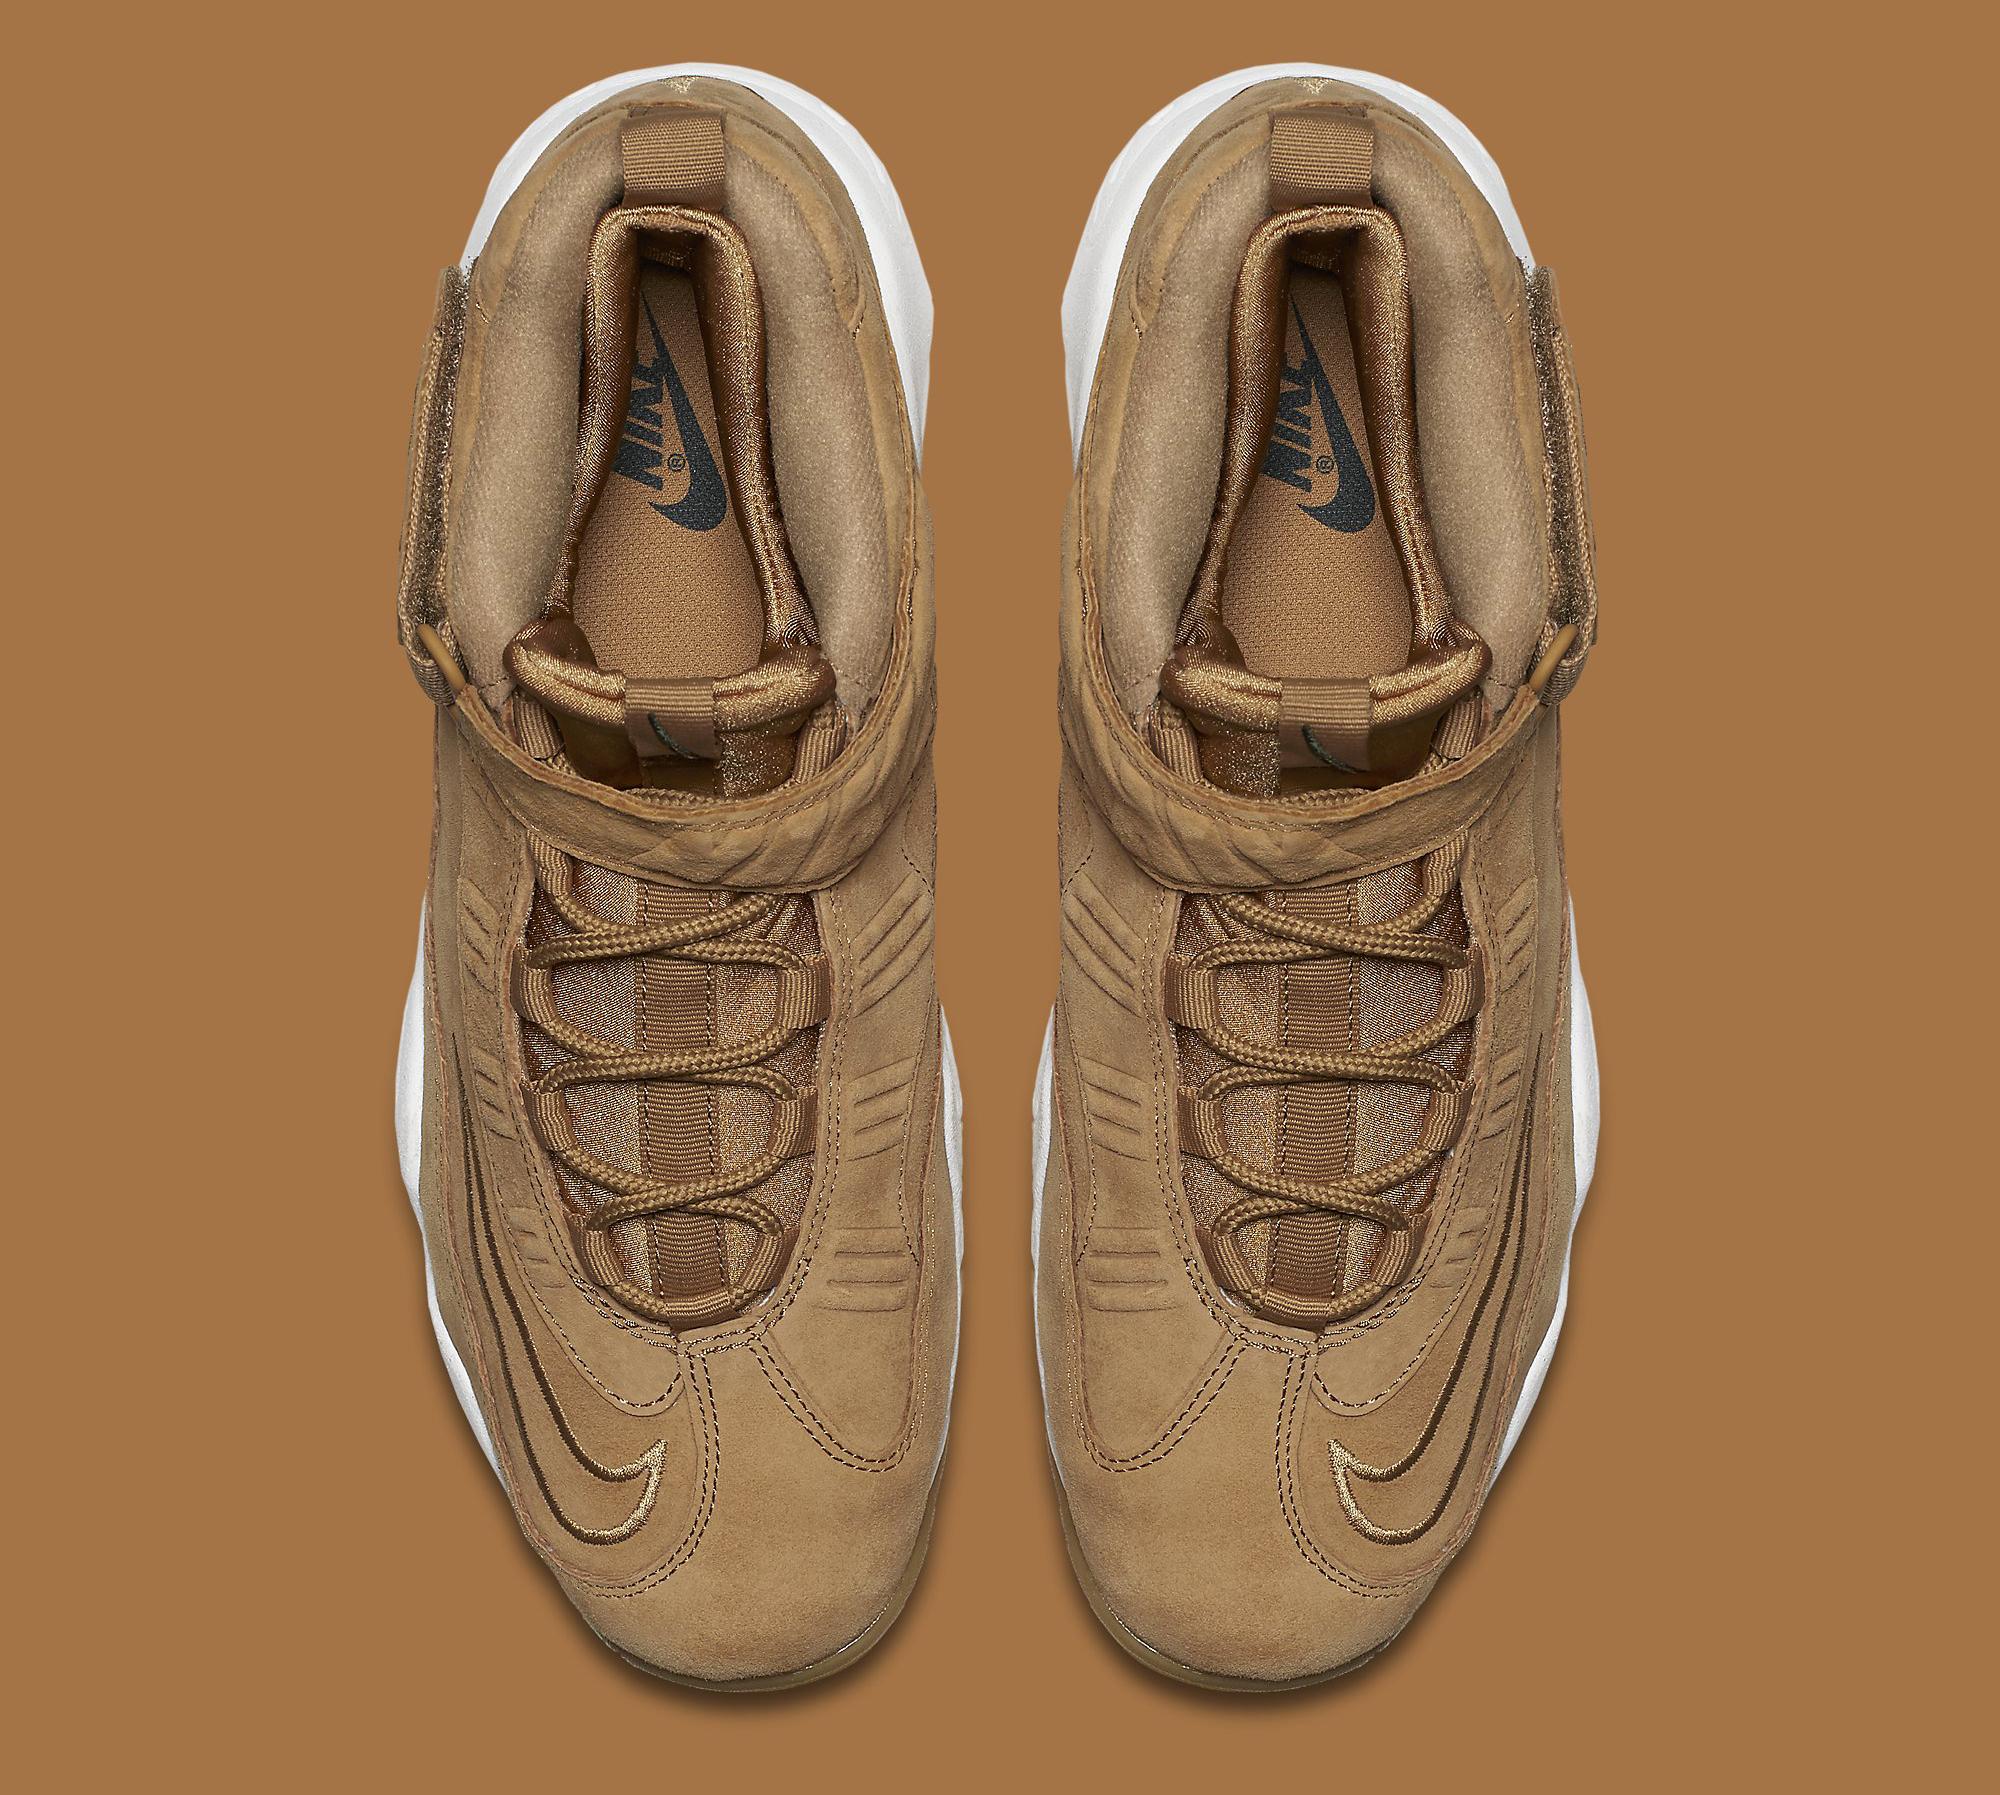 Wheat Nike Griffey Max 1 354912-200 Top